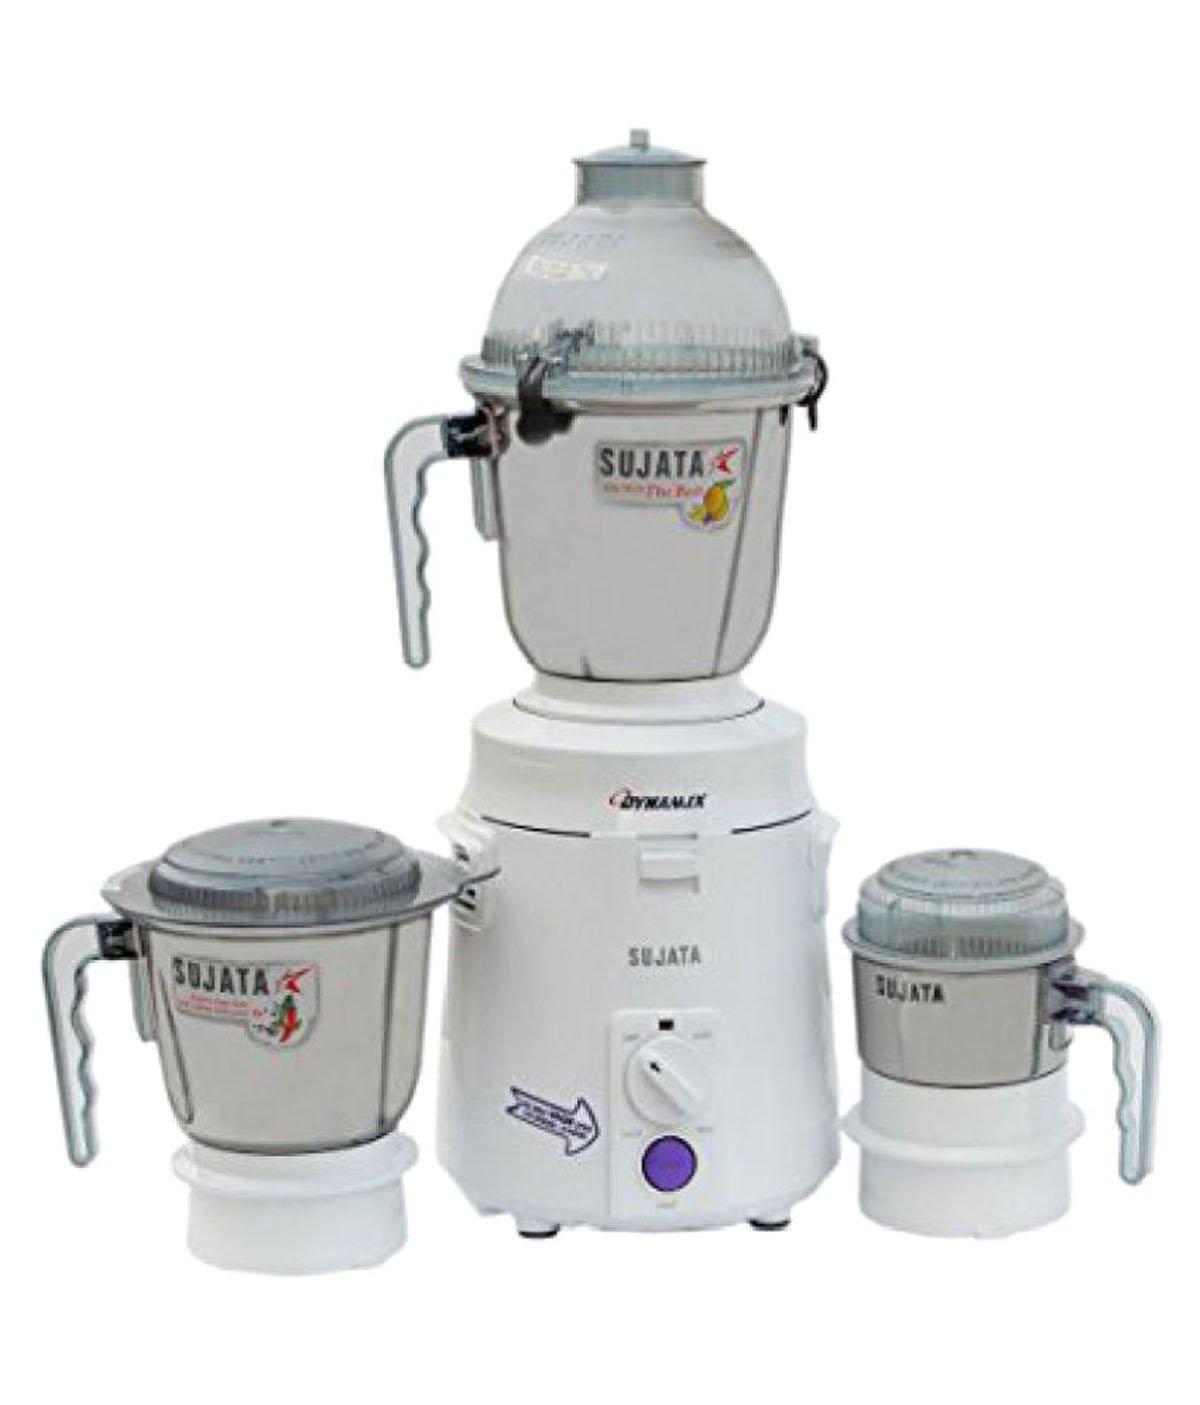 sujata-best-mixer-grinder-india